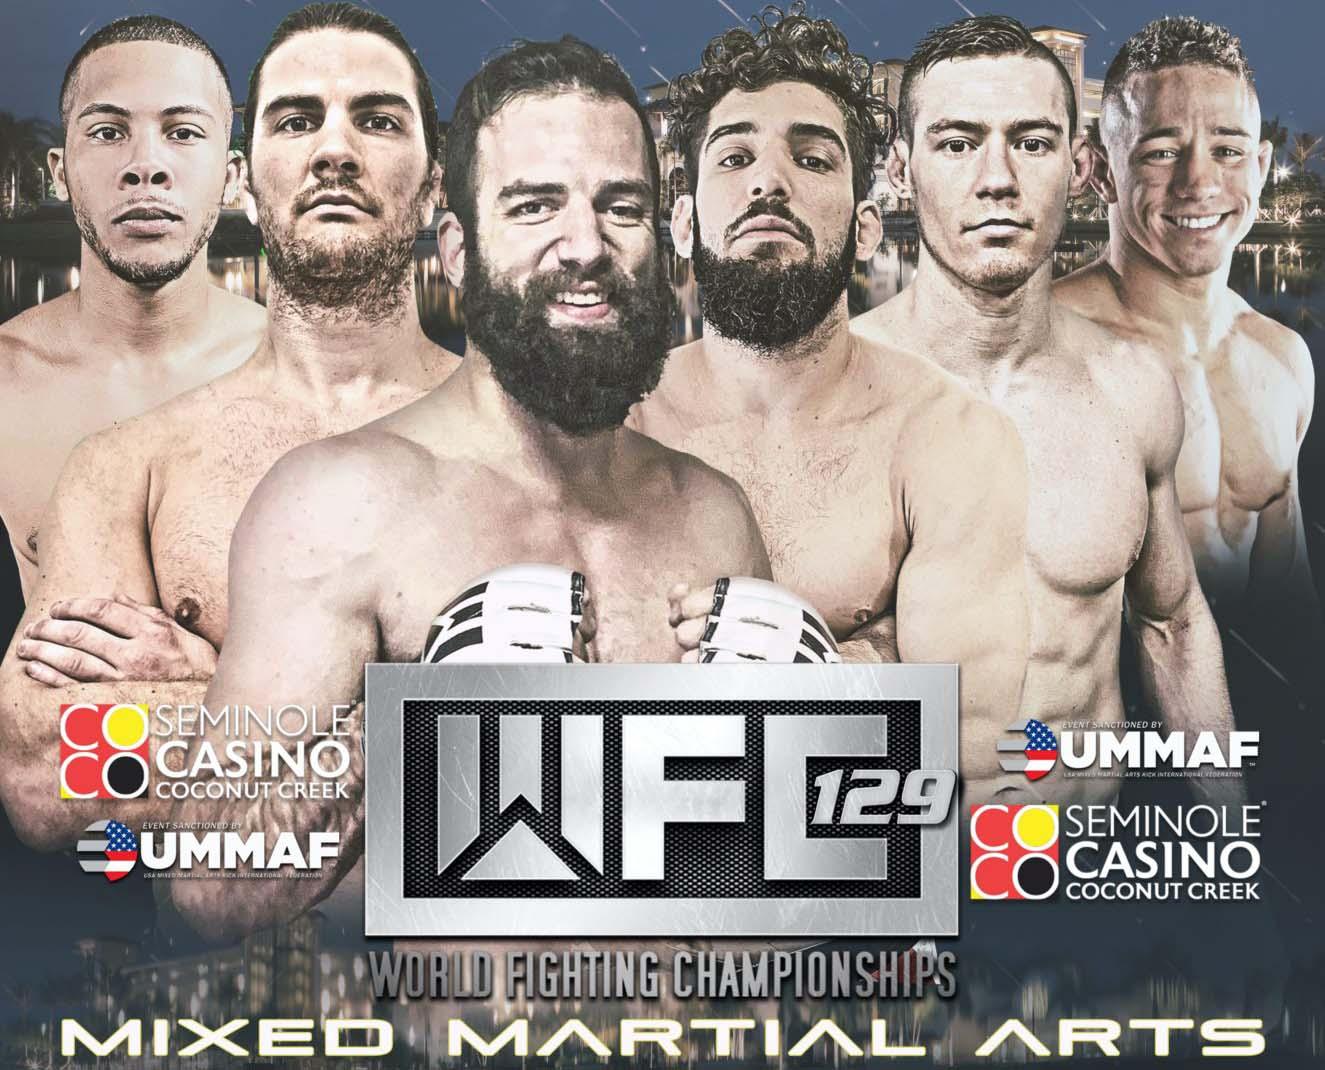 World Fighting Championship Florida